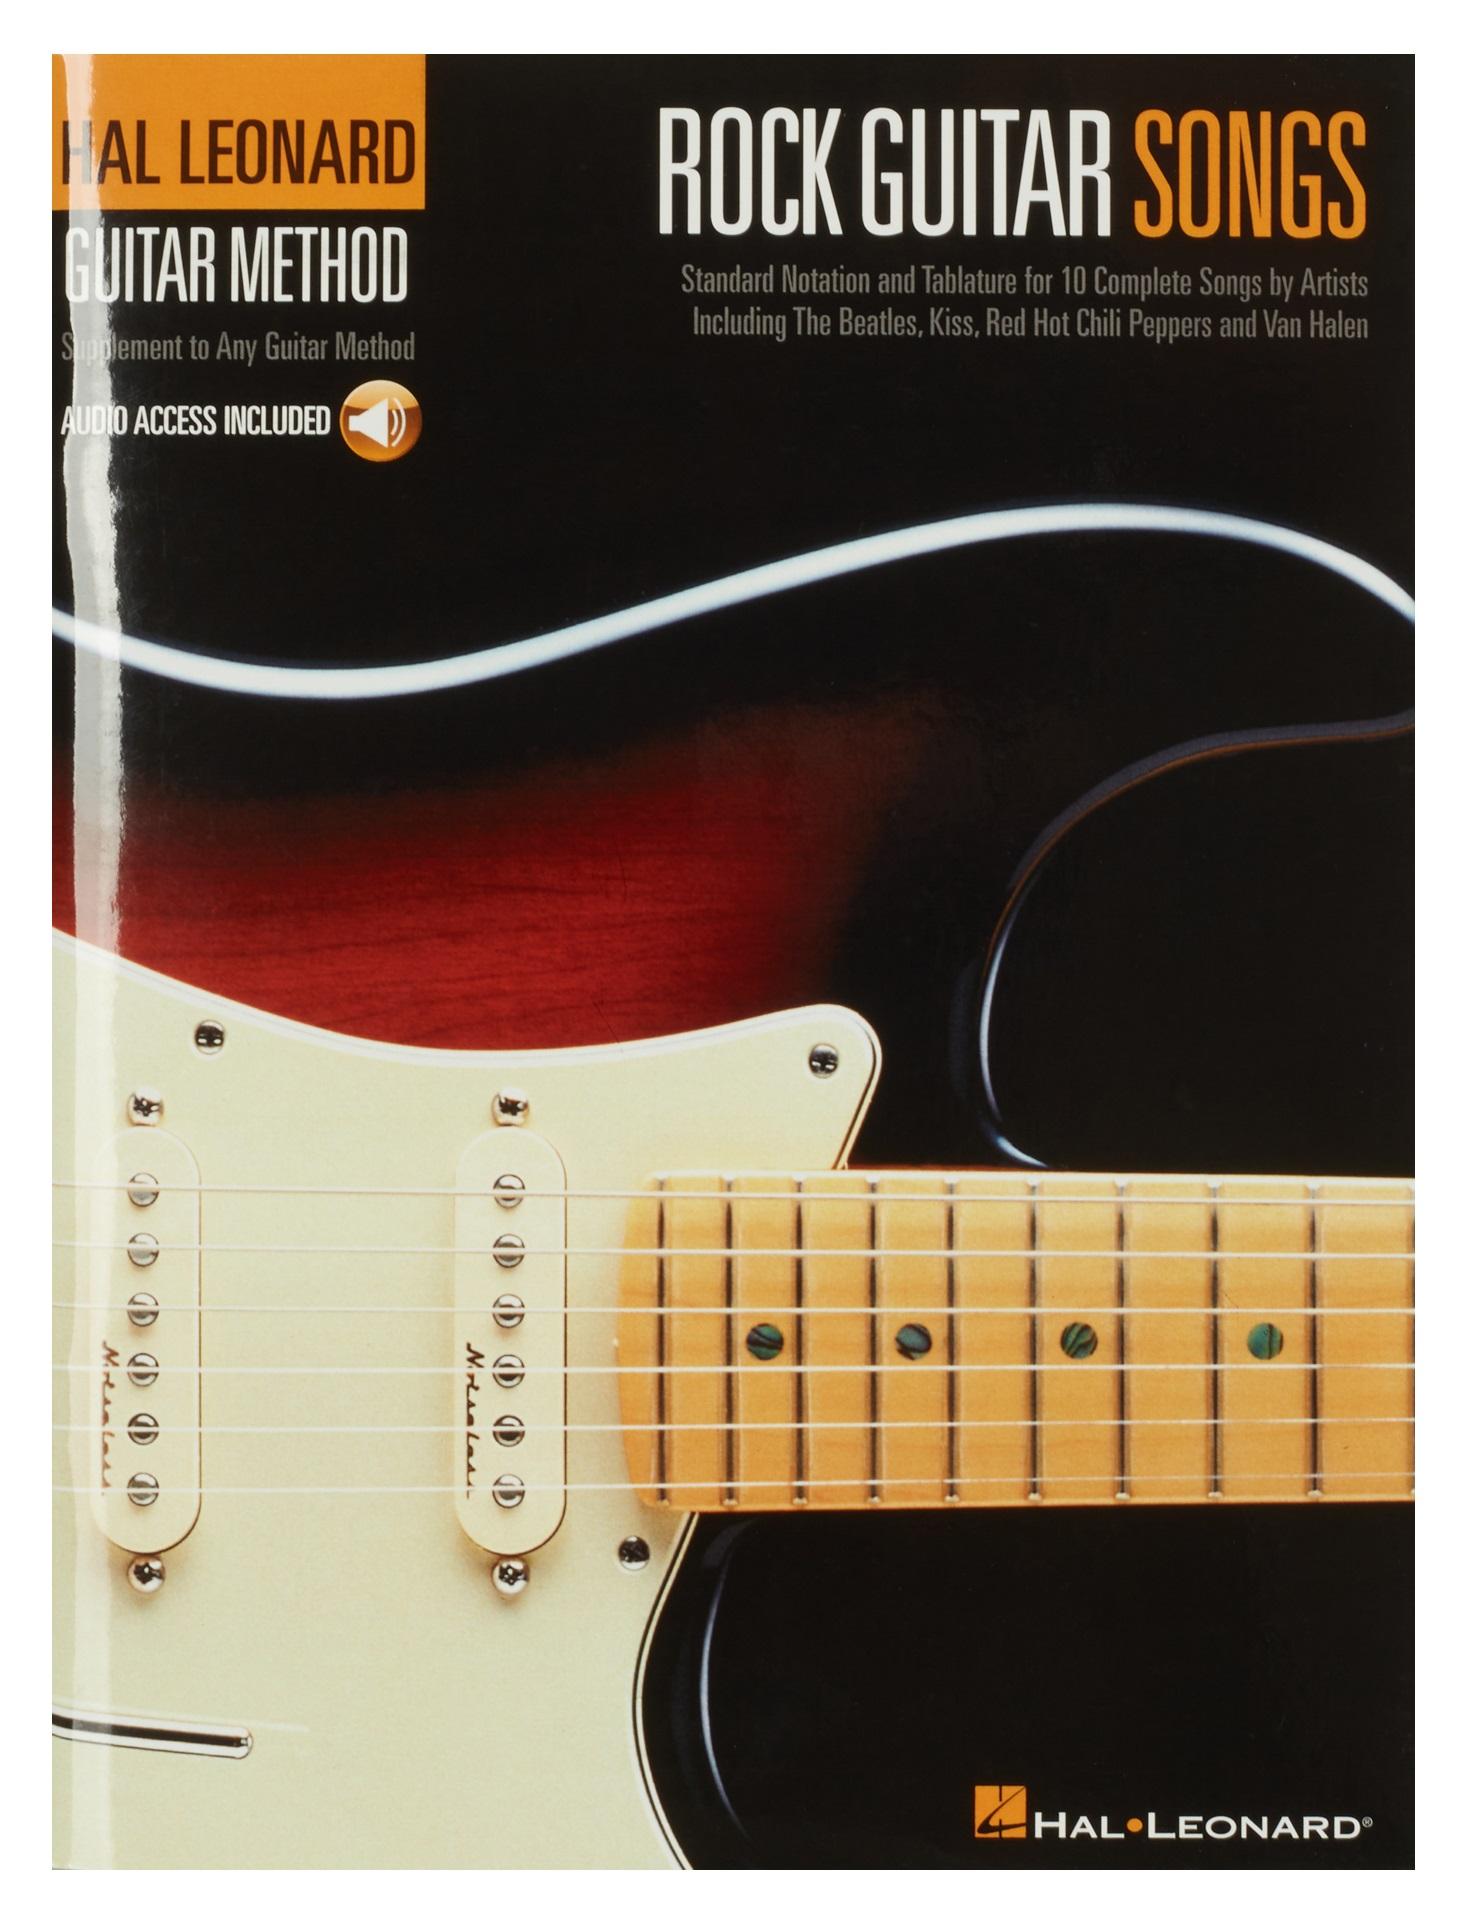 MS Hal Leonard Guitar Method: Rock Guitar Songs